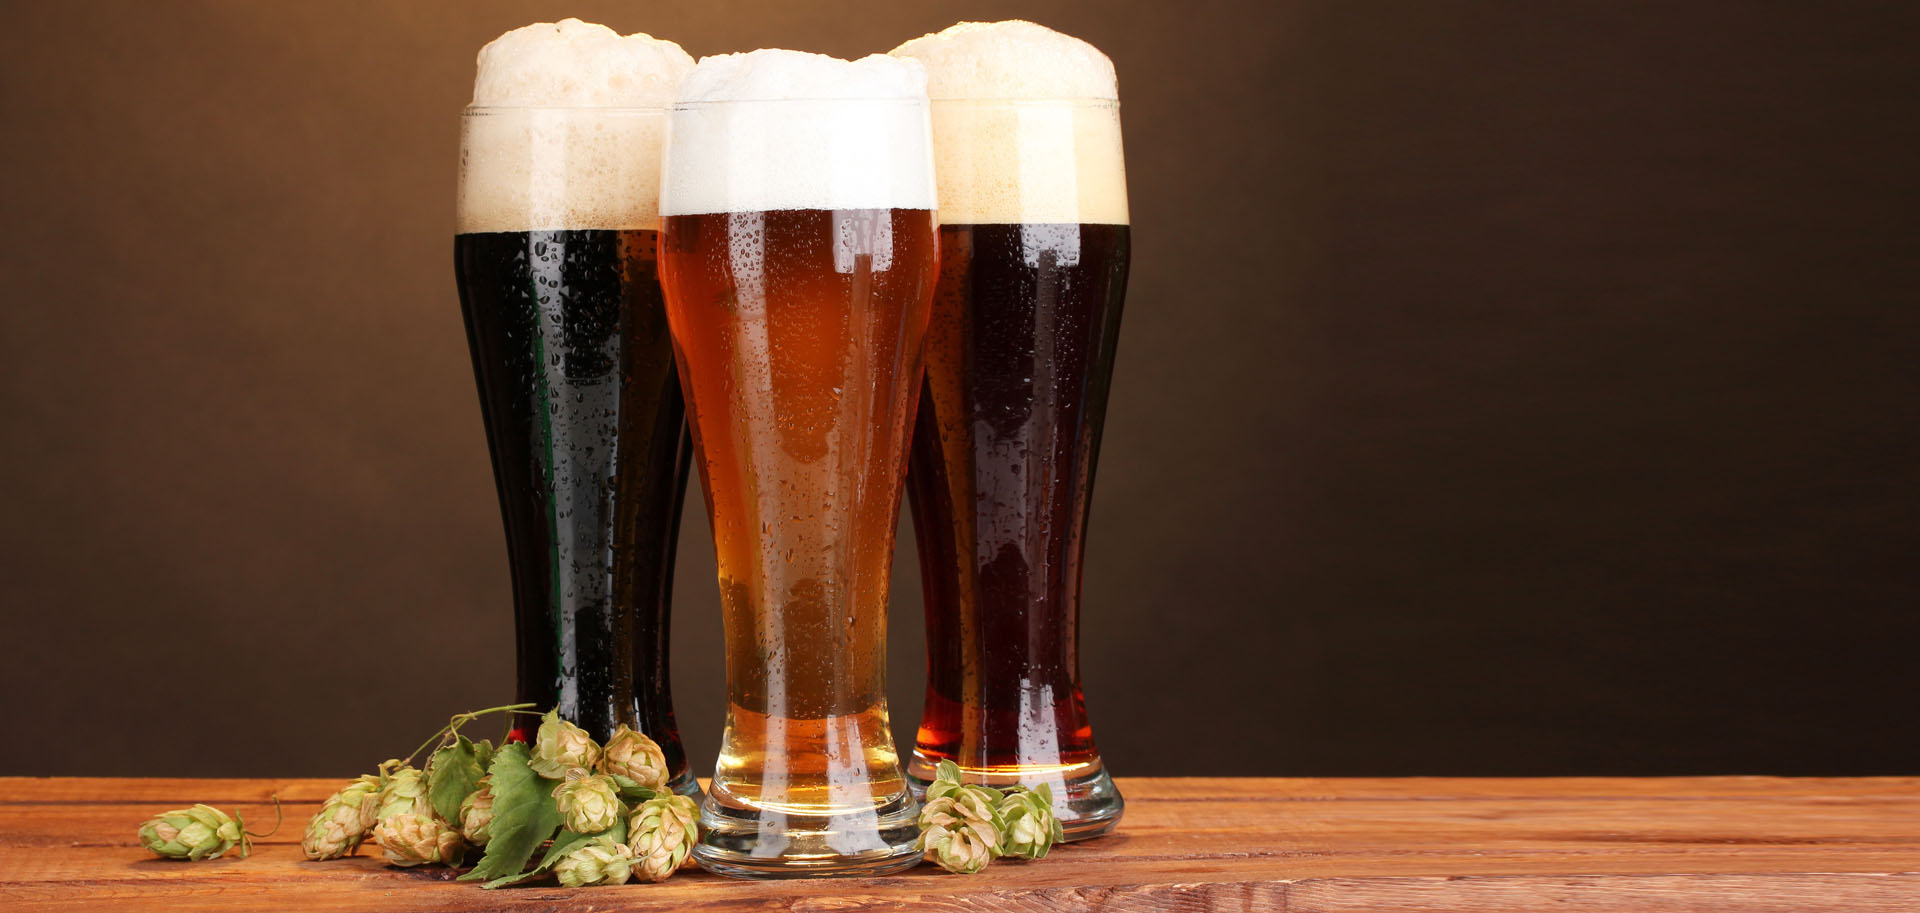 3 bicchieri di birra artigianale